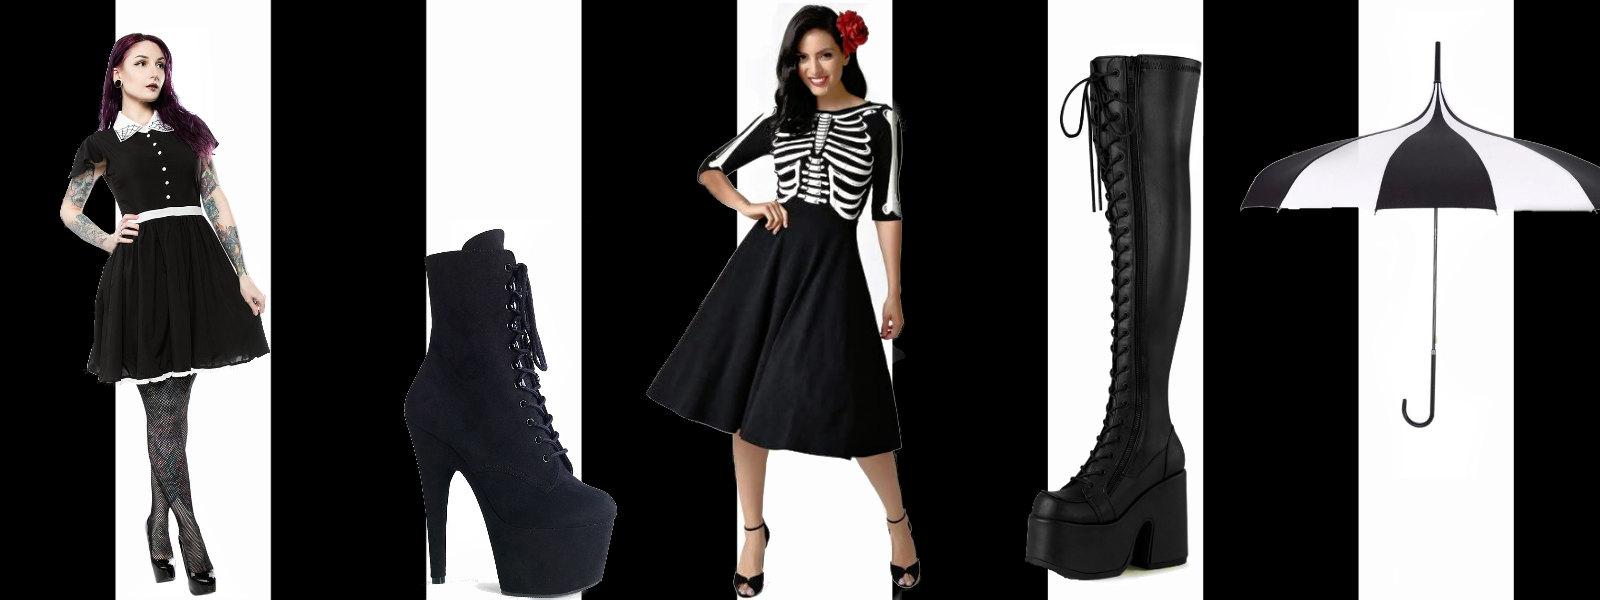 Women's Gothic Clothing store, Alternative and Plus Size Clothing